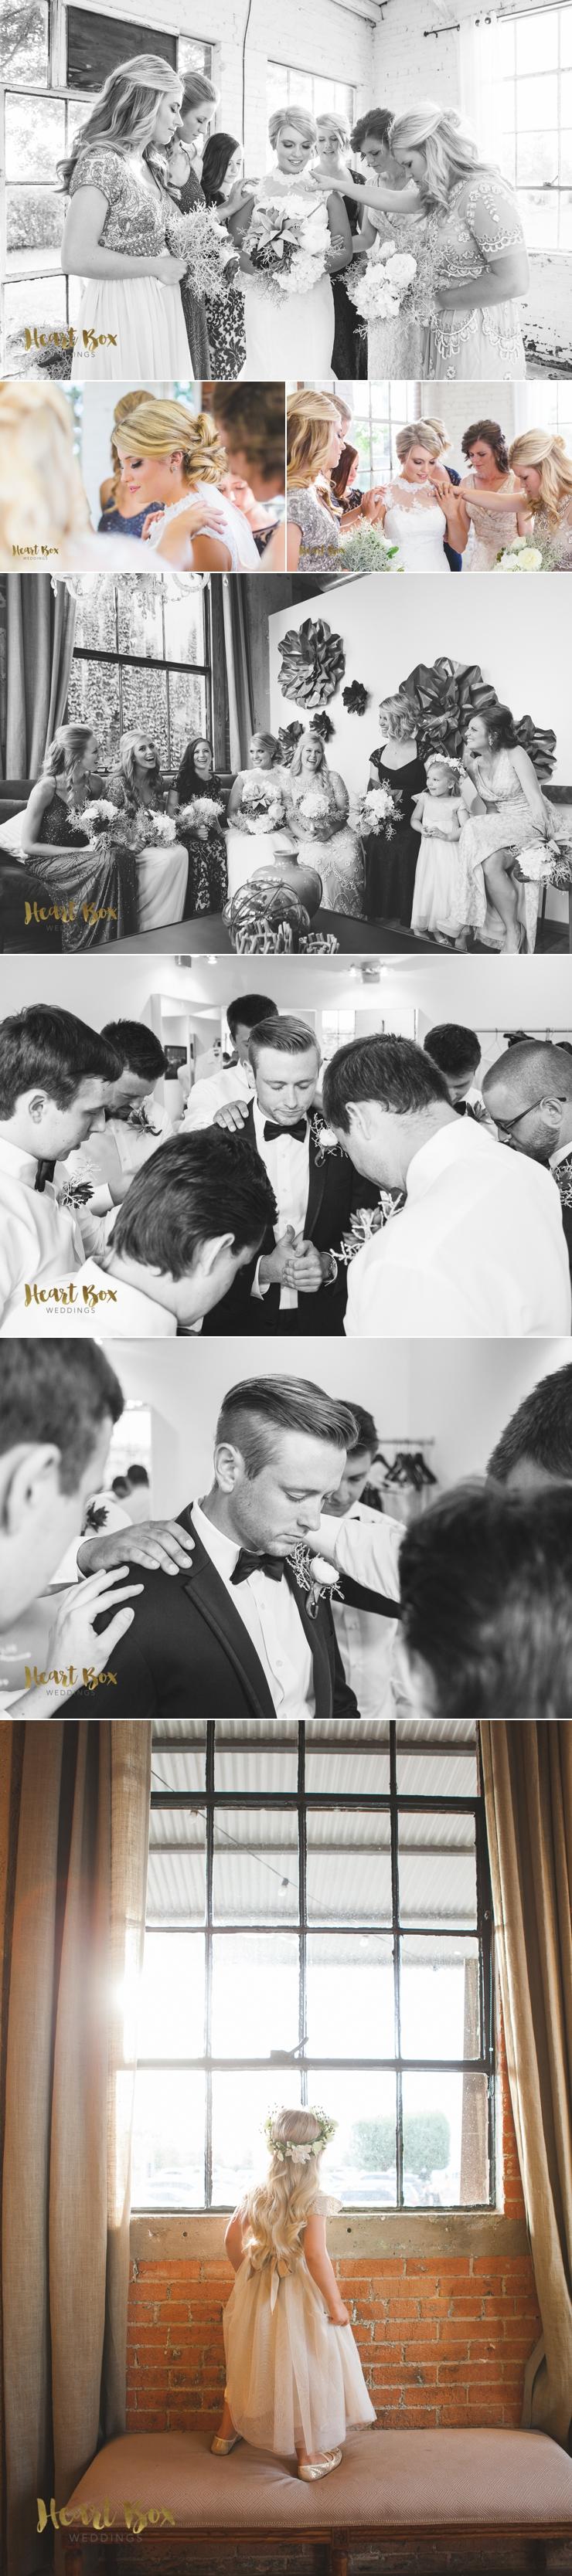 Mabry Wedding 14.jpg